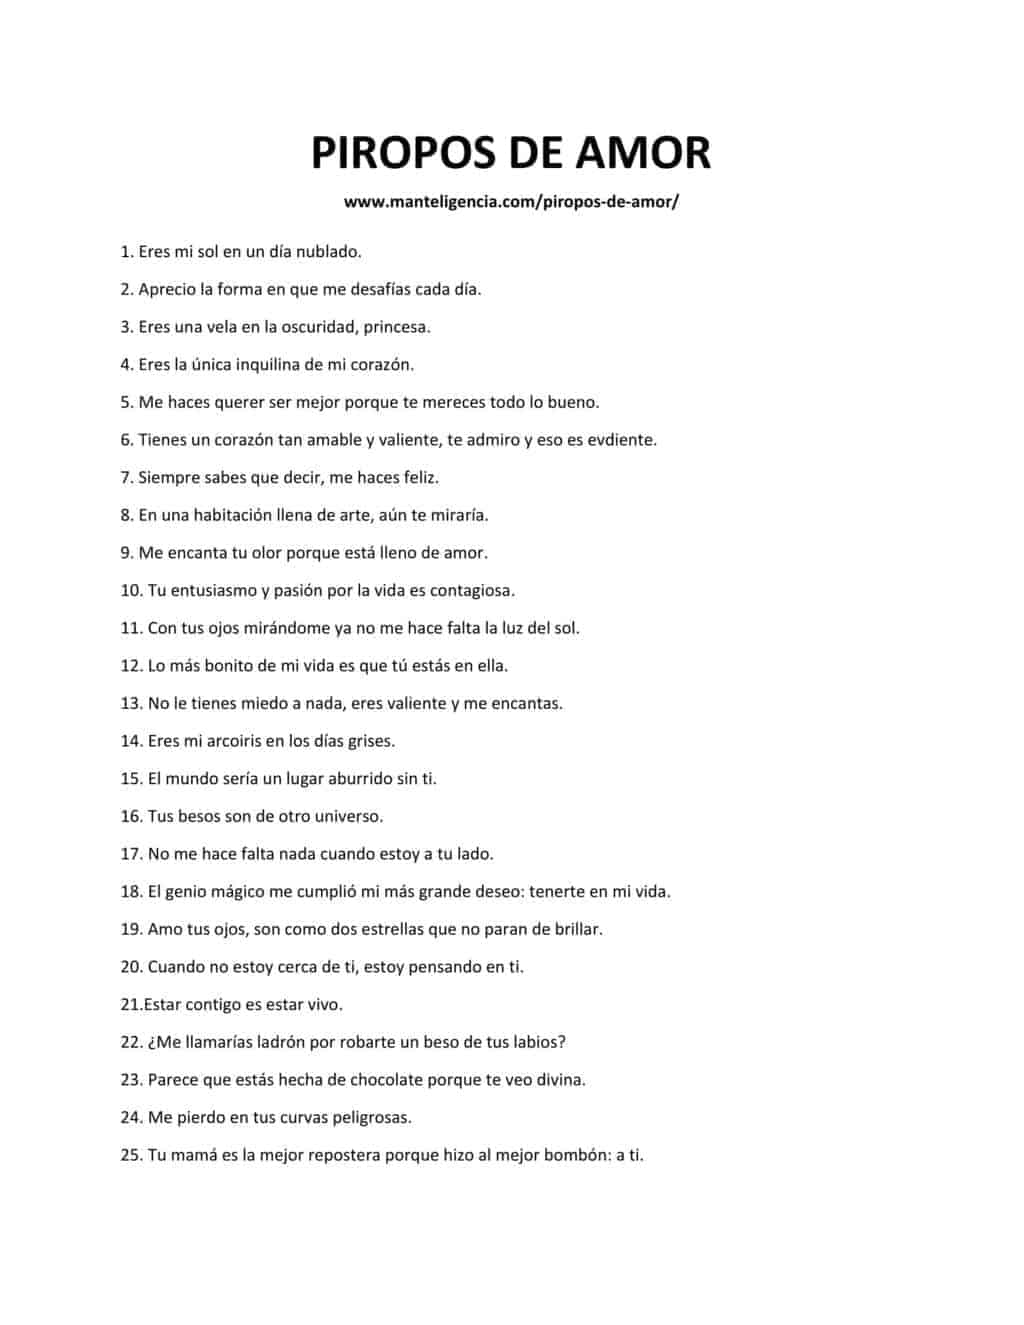 PIROPOS DE AMOR-1